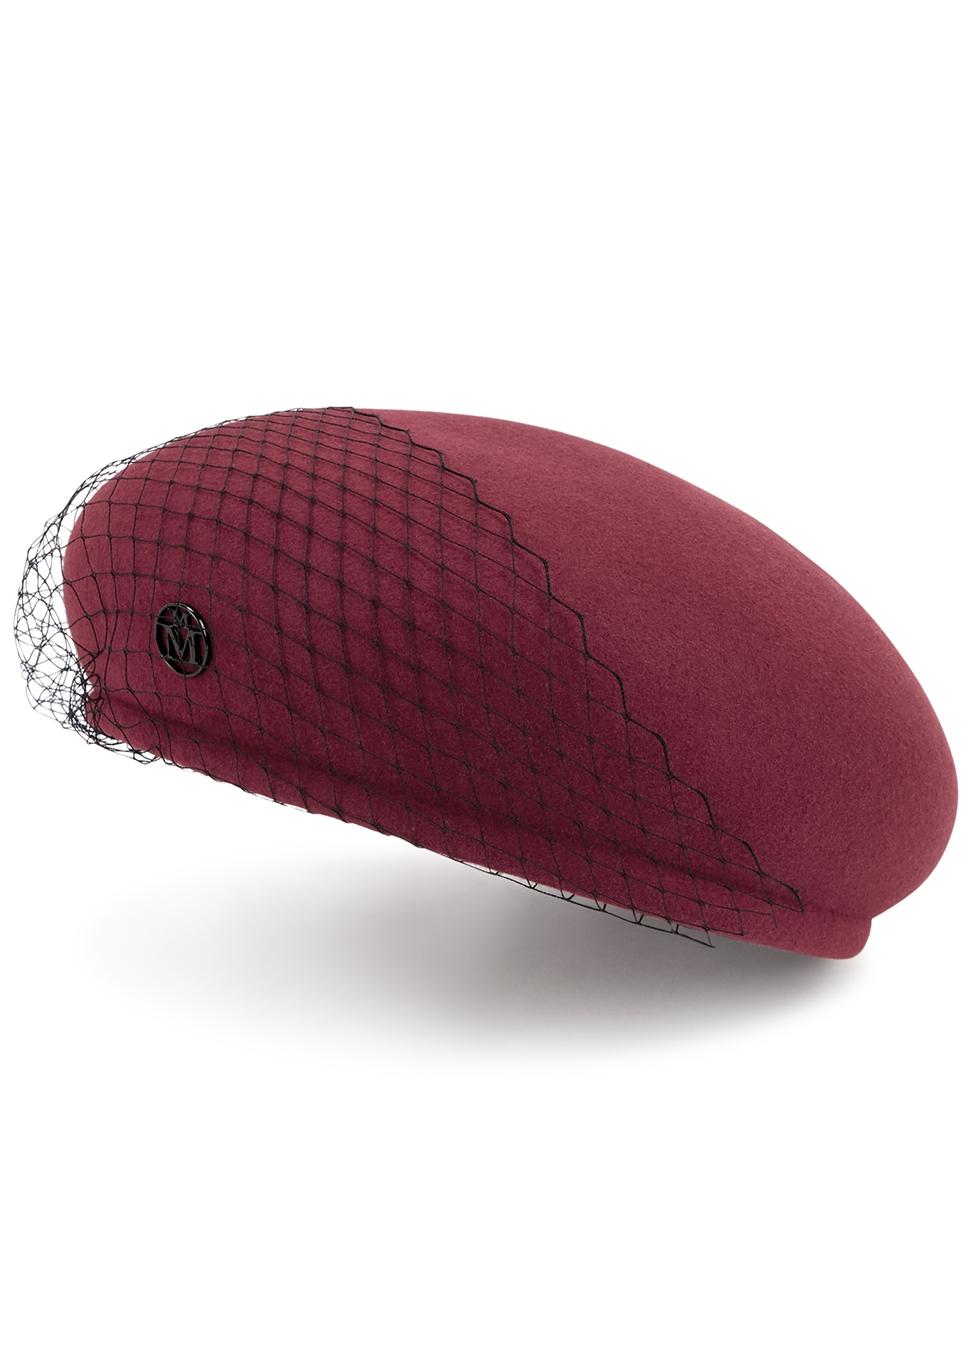 New Bonnie burgundy veiled felt beret